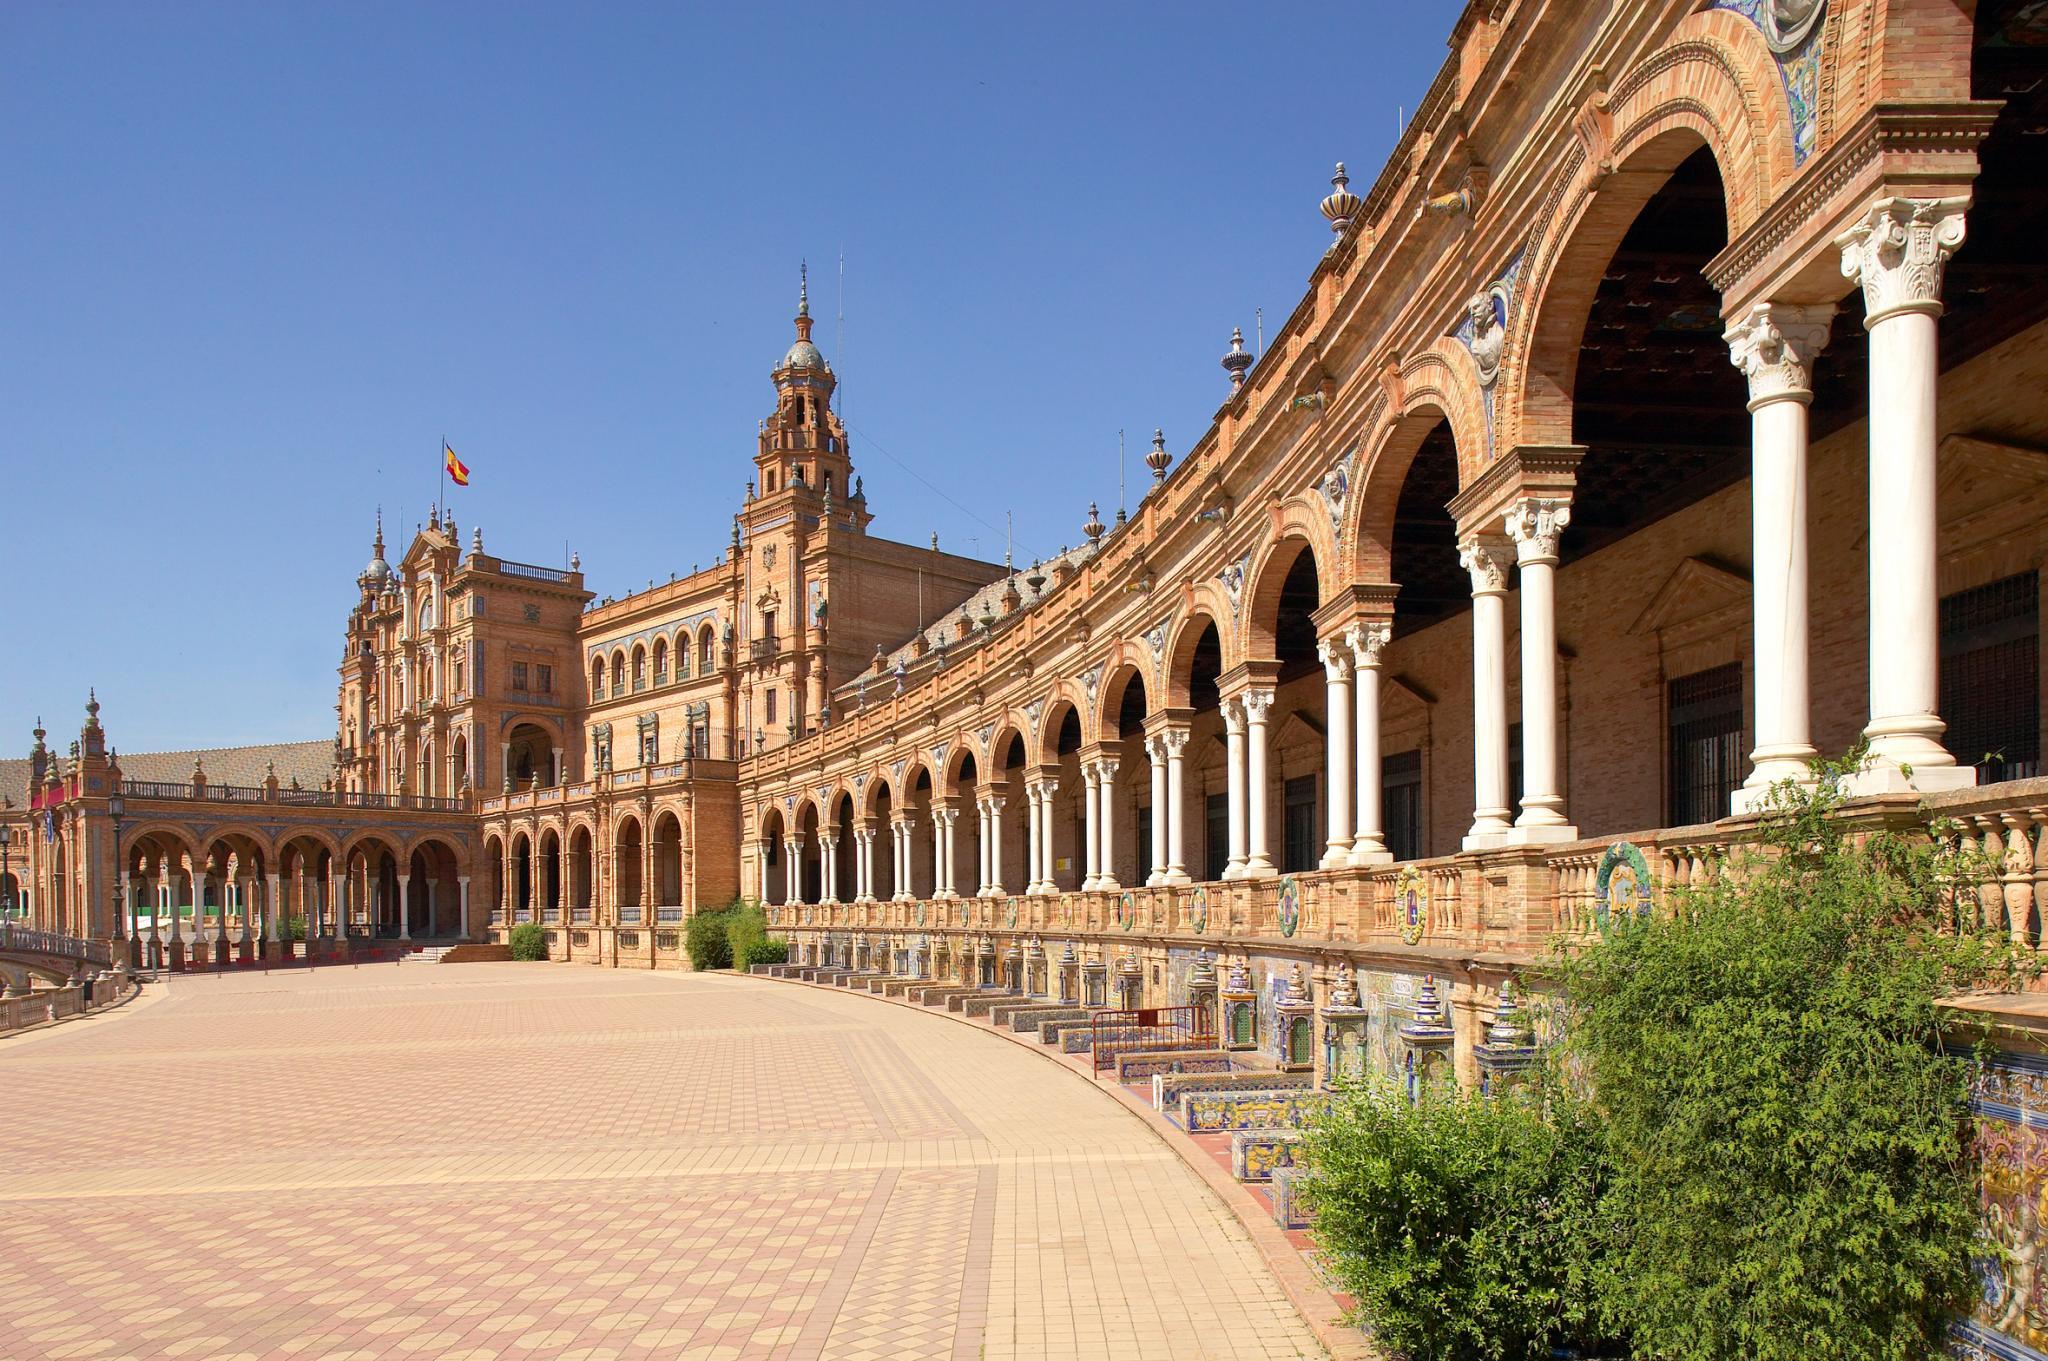 Hotel Seville Spa